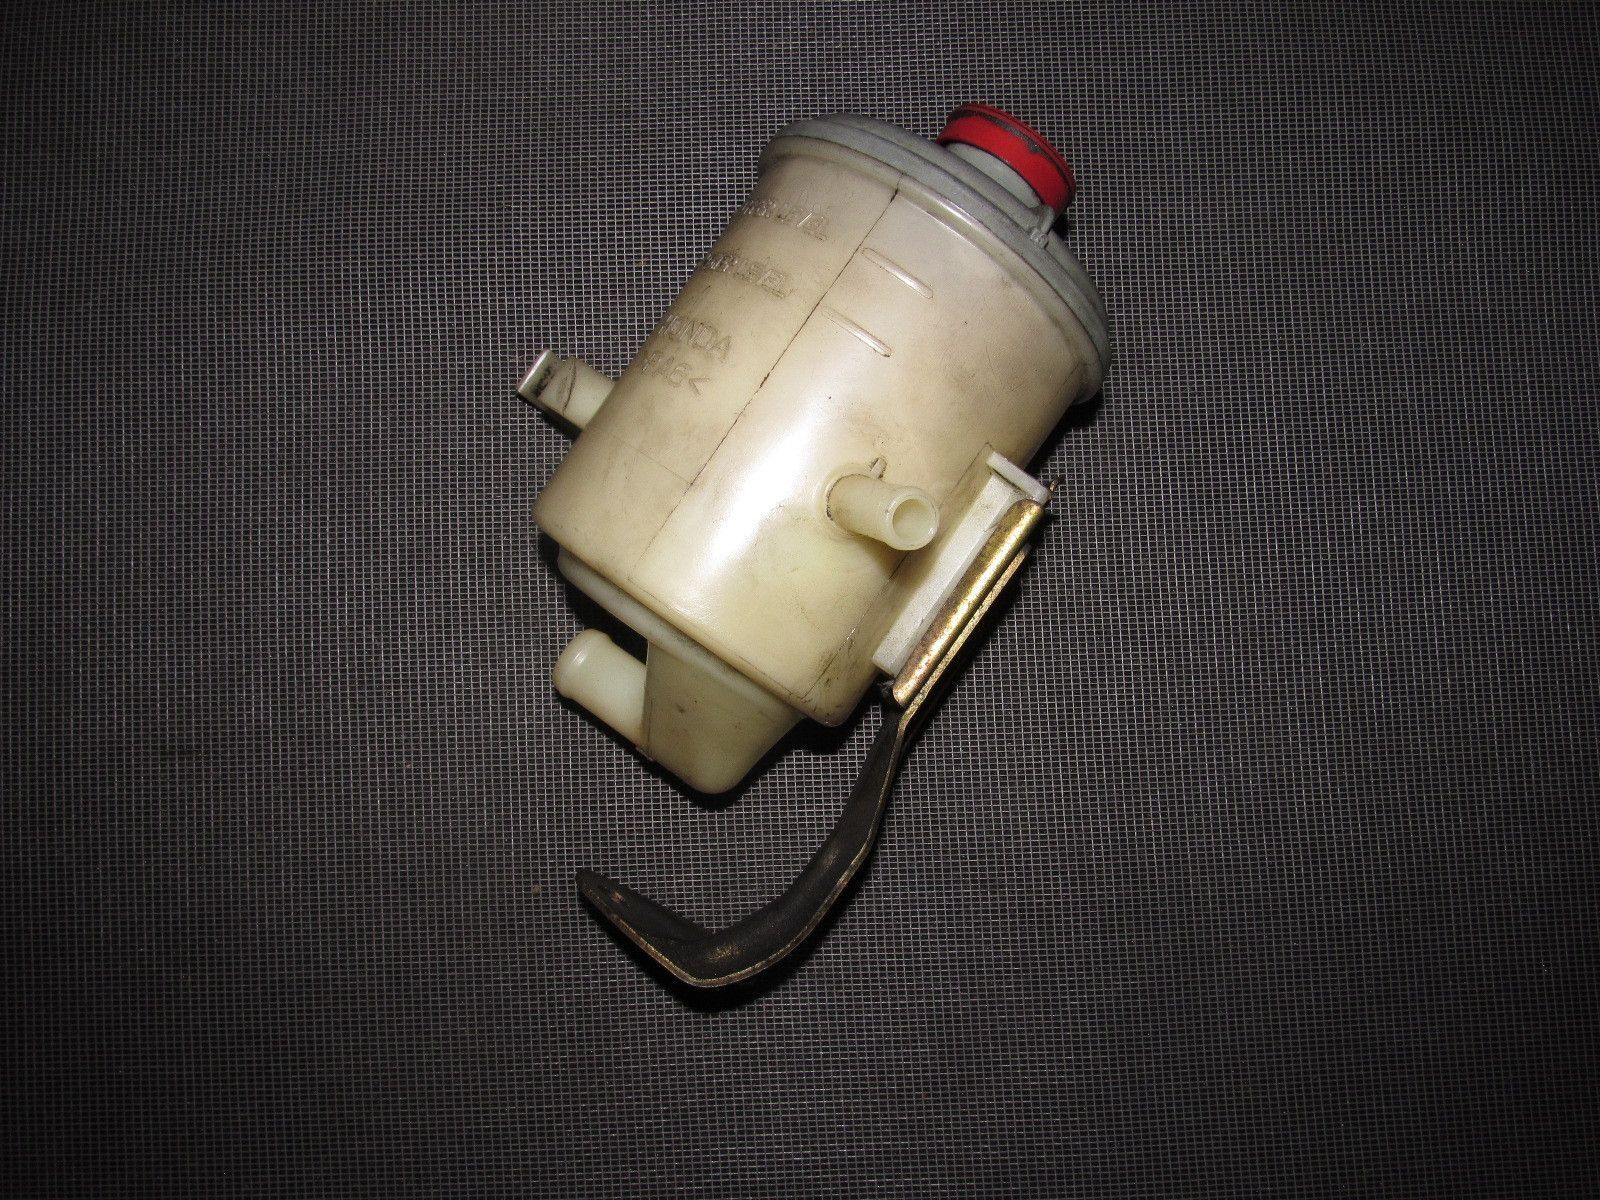 93 94 95 Honda Del Sol Oem Interior Fuse Box Autopartone Expert Diagram B16a Power Steering Reservoir Tank